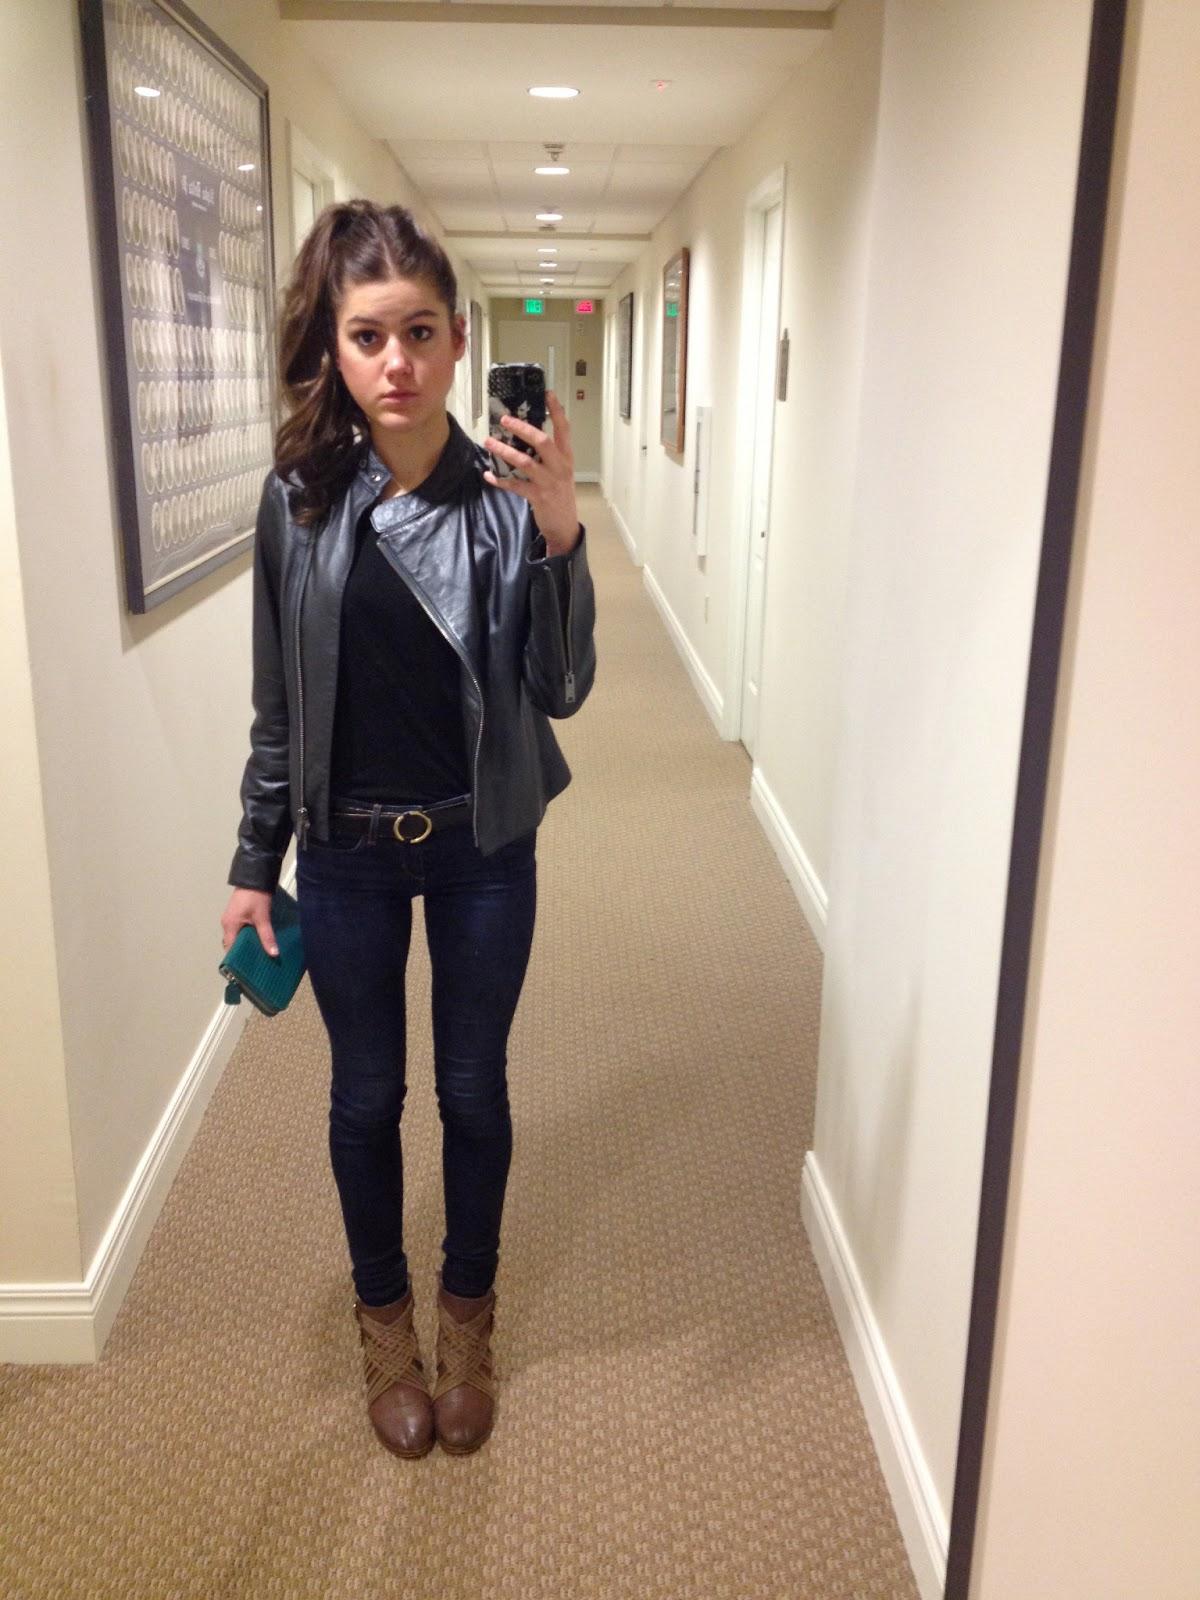 Black Leather Jacket Women Outfit Wallpaper Hd